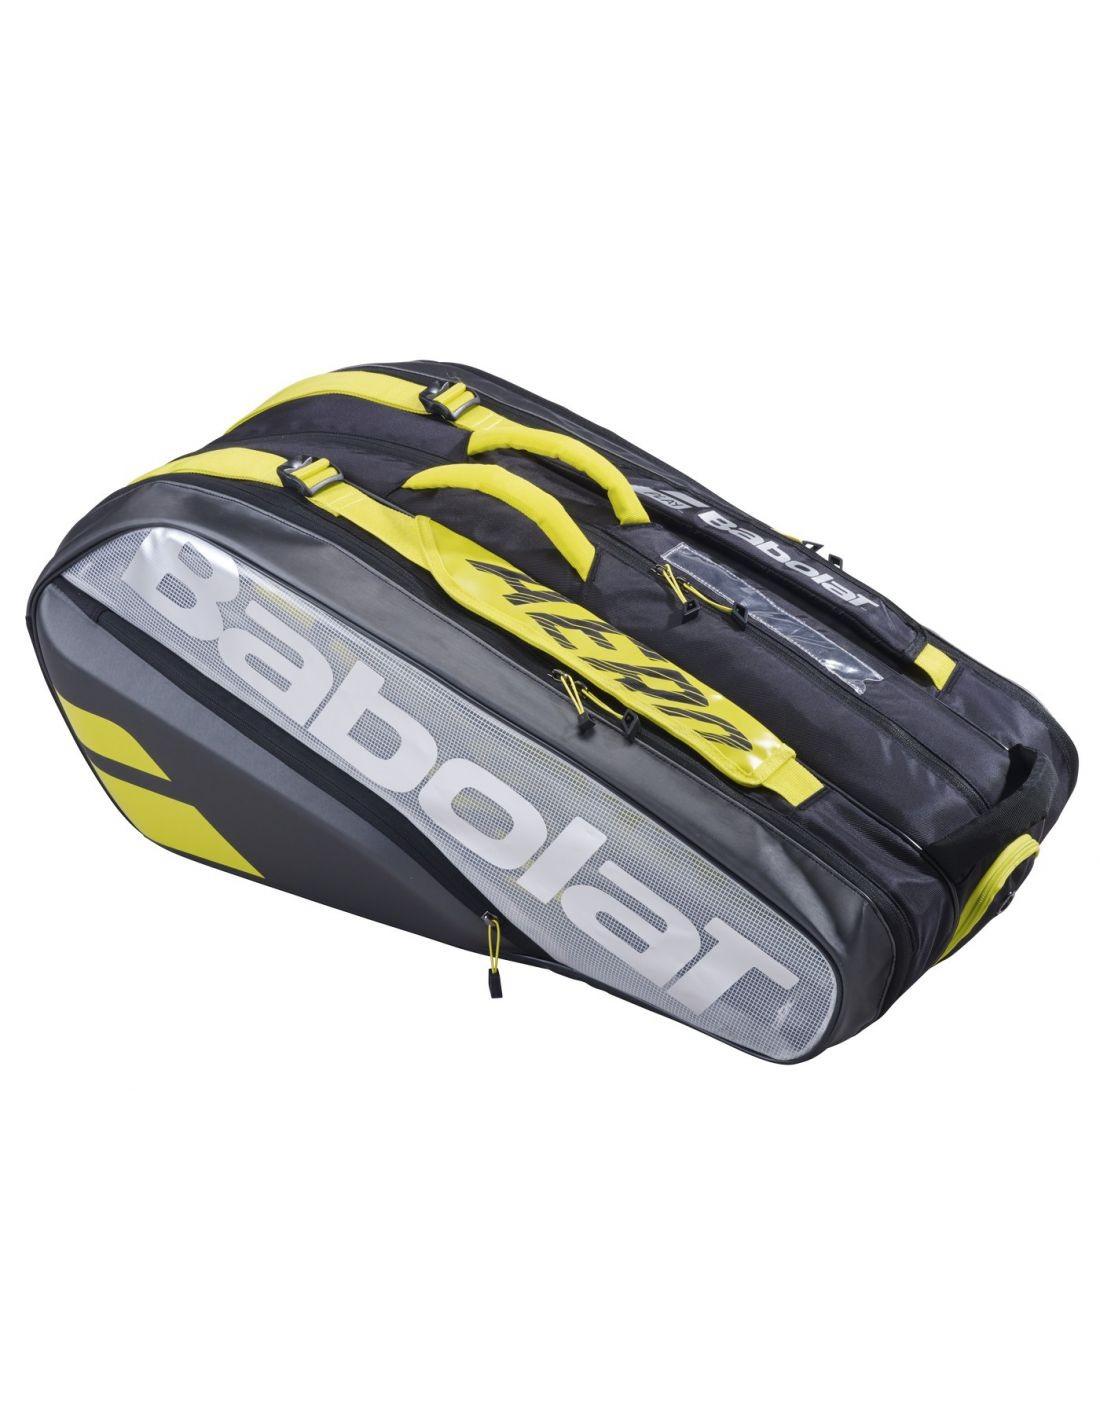 Torba tenisowa Babolat Pure Aero VS x9 Limited